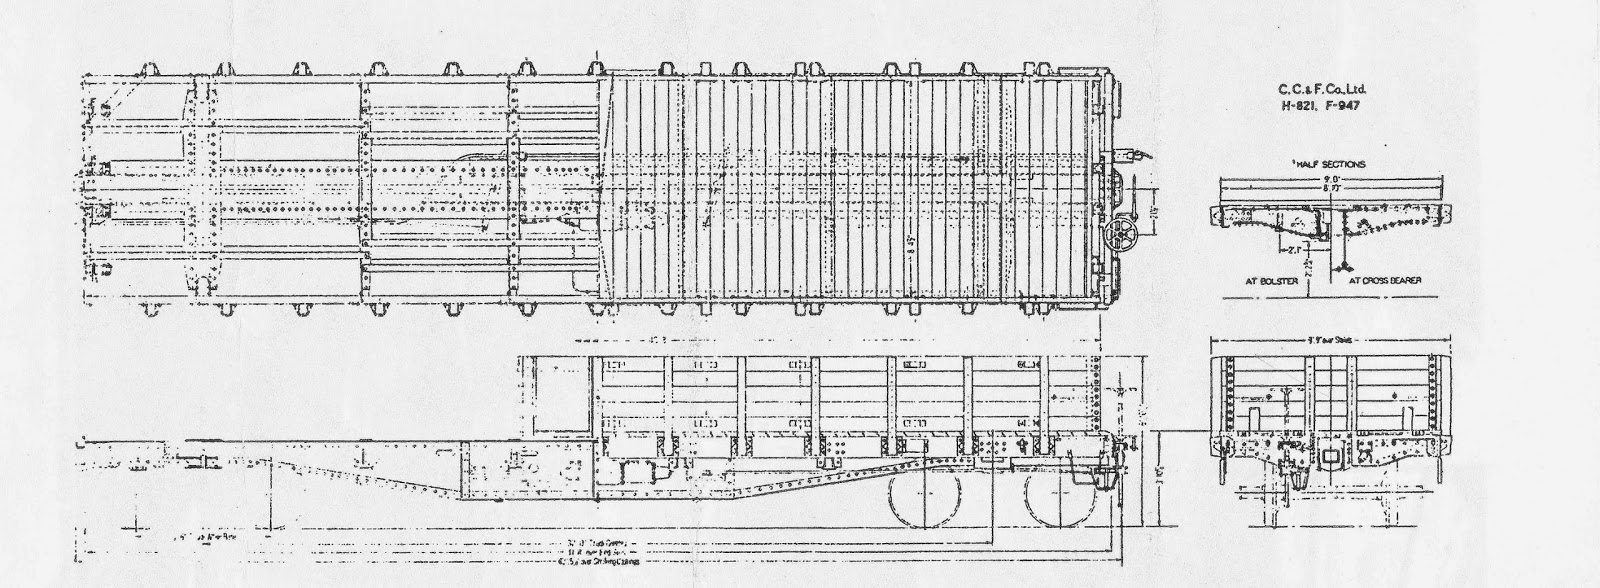 hight resolution of 1950 western car lift schematic custom wiring diagram u2022 chamberlain garage door sensor wiring residential garage electrical wiring diagrams